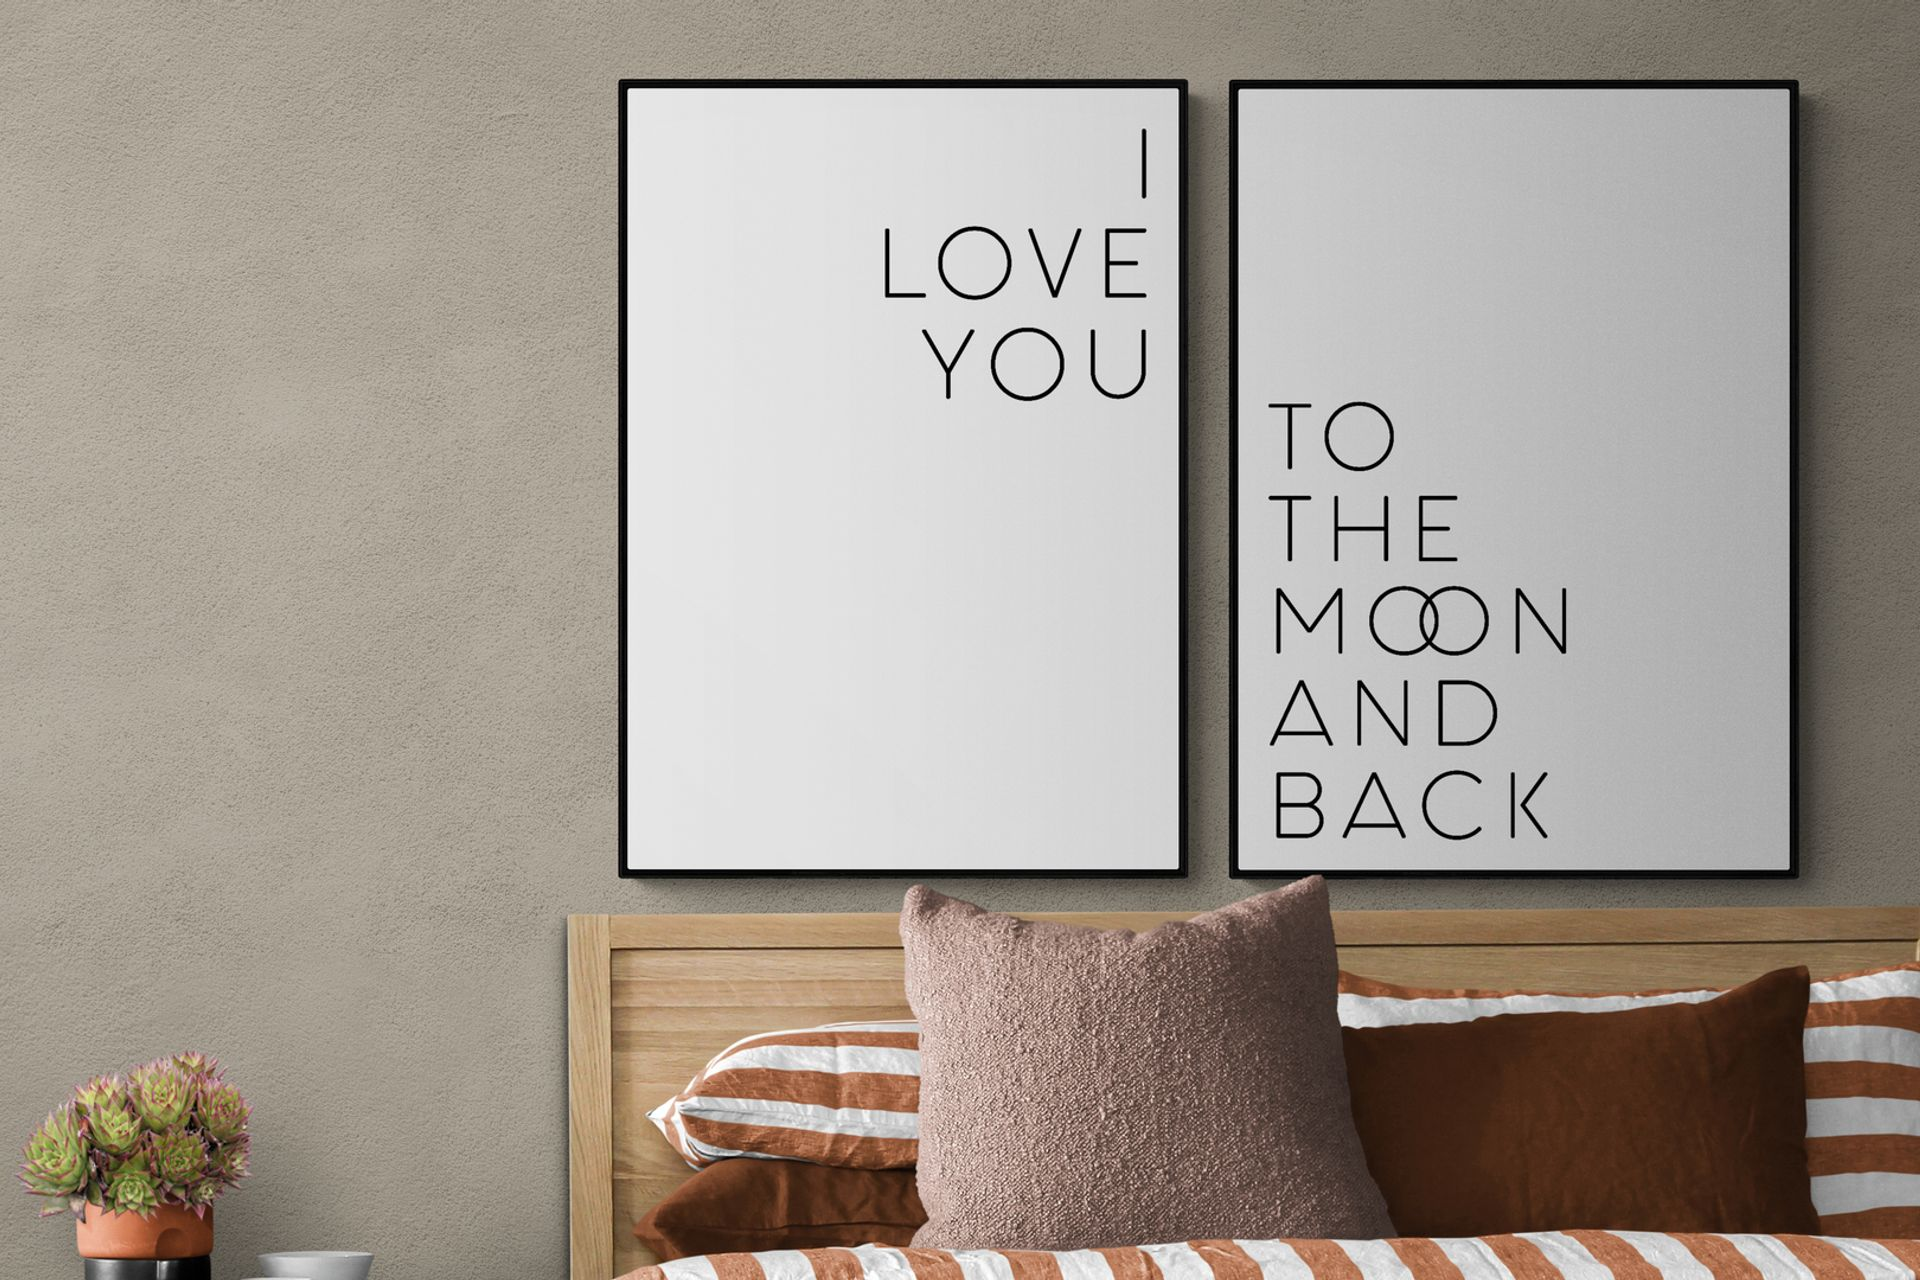 I LOVE YOU MOON THE BACK SİYAH ÇERÇEVE TABLO SETİ 50X70